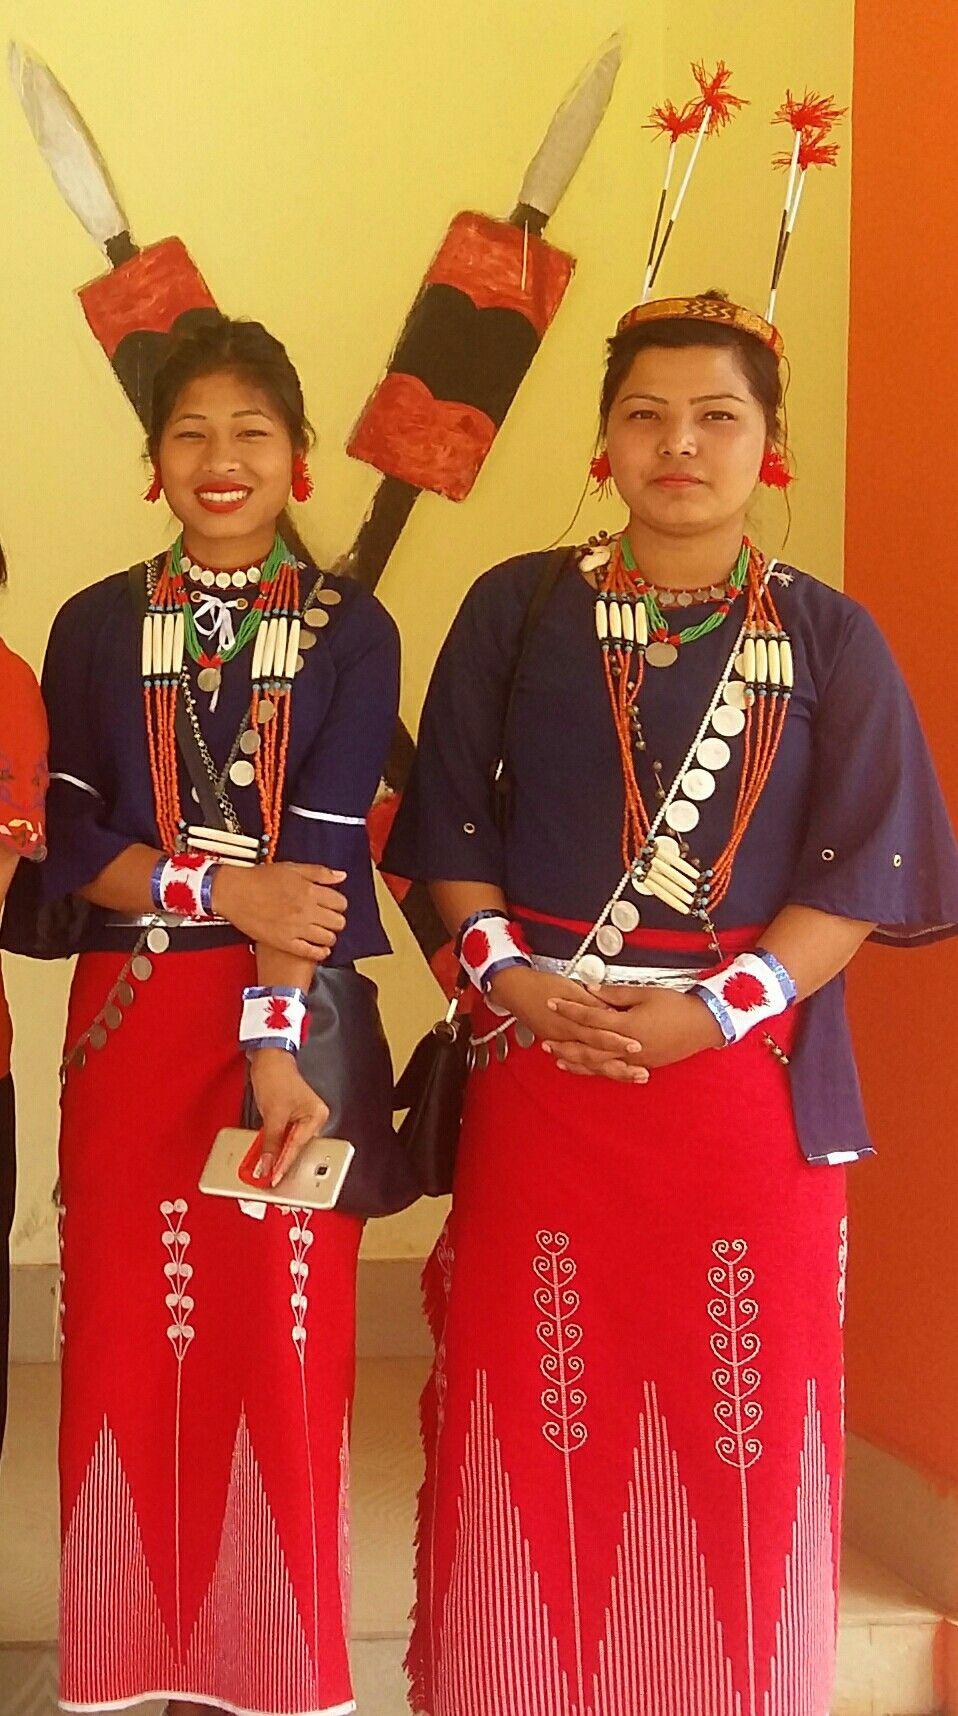 Pin by Lenmem Dai on Tutsa tribe of Tirap Arunachal